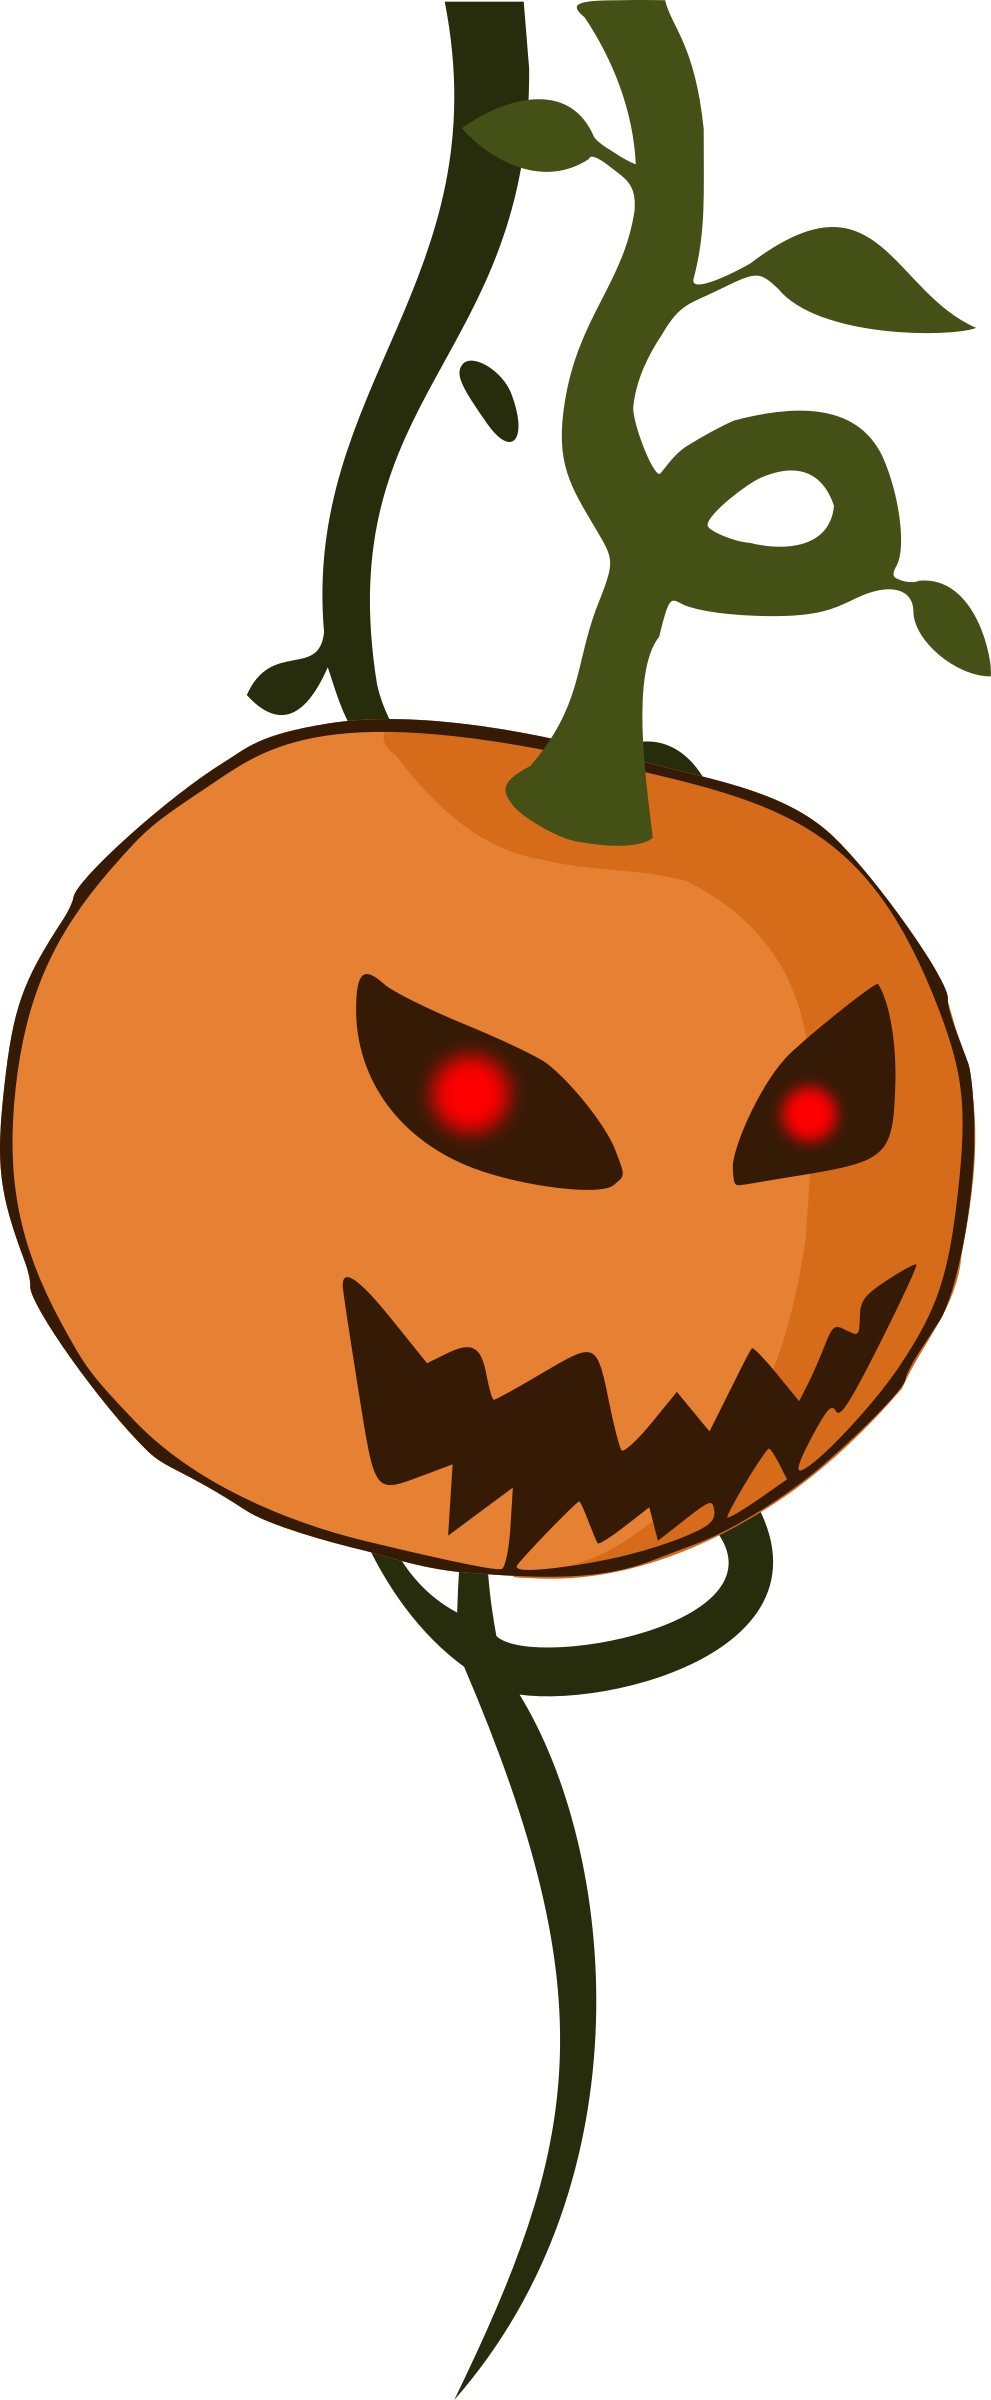 Clipart - Cartoon jack-o'-lantern pumpkin royalty free